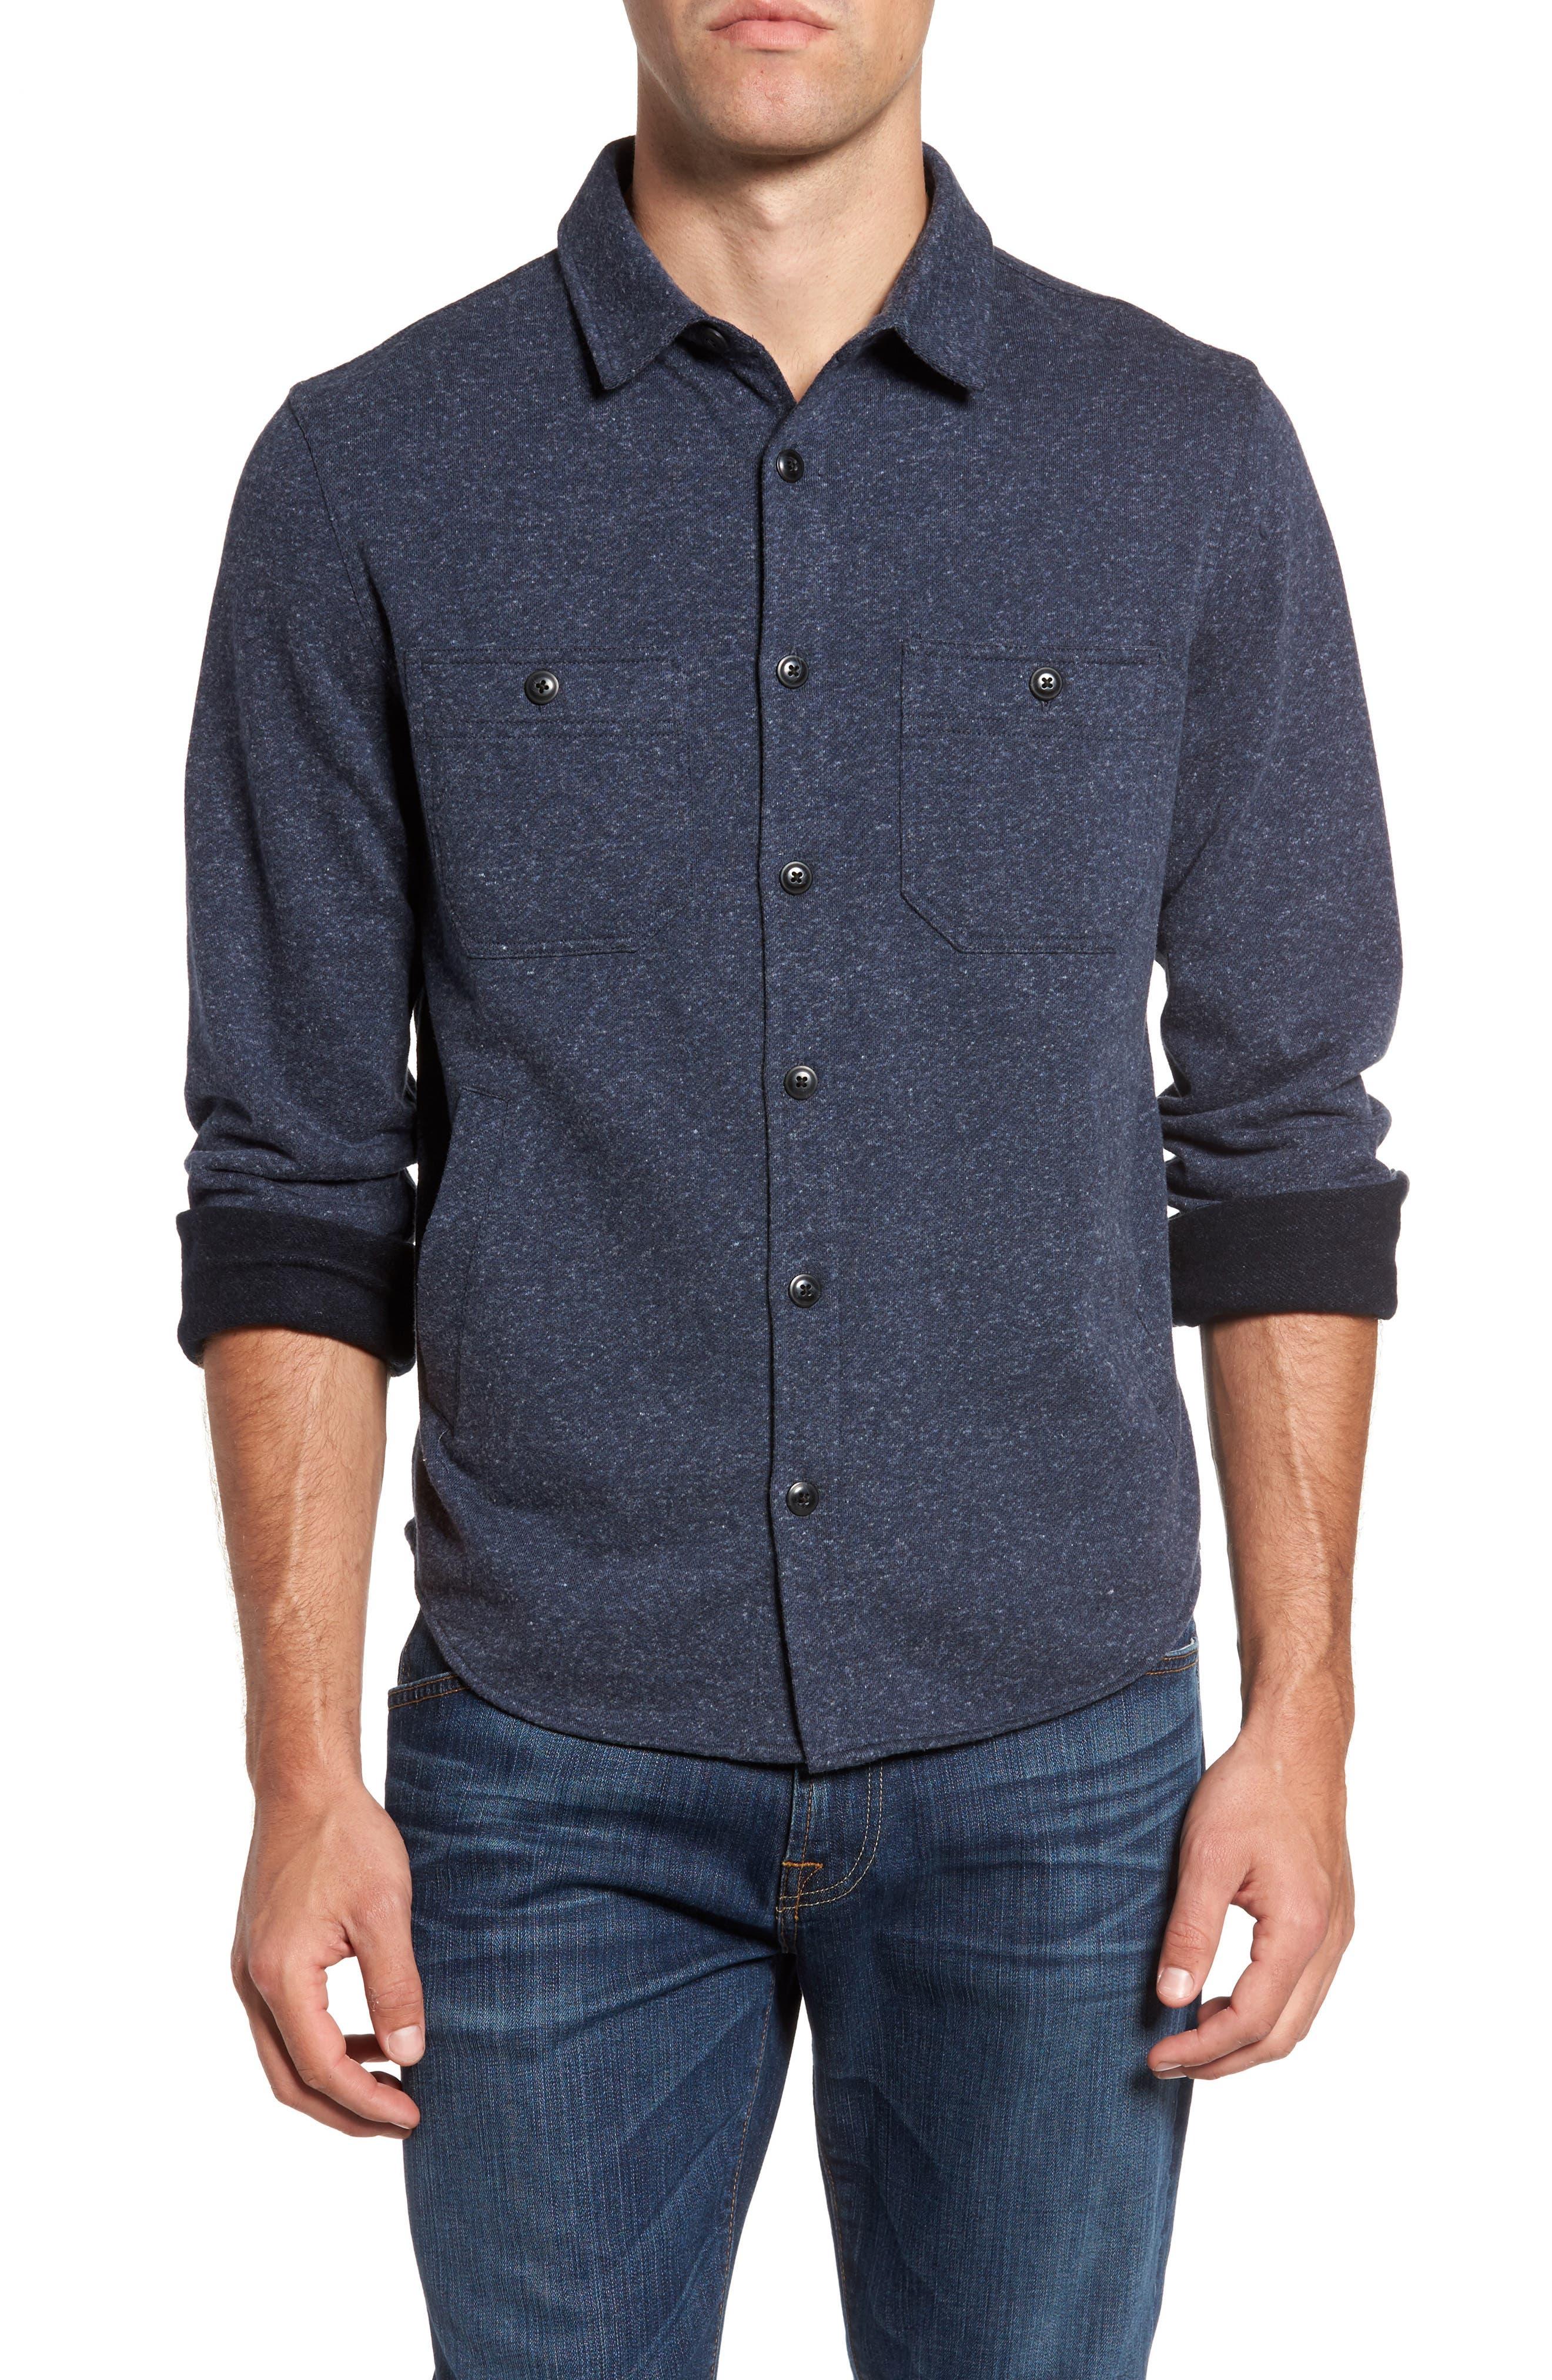 Grayers Bayswater Modern Fit Heathered Shirt Jacket